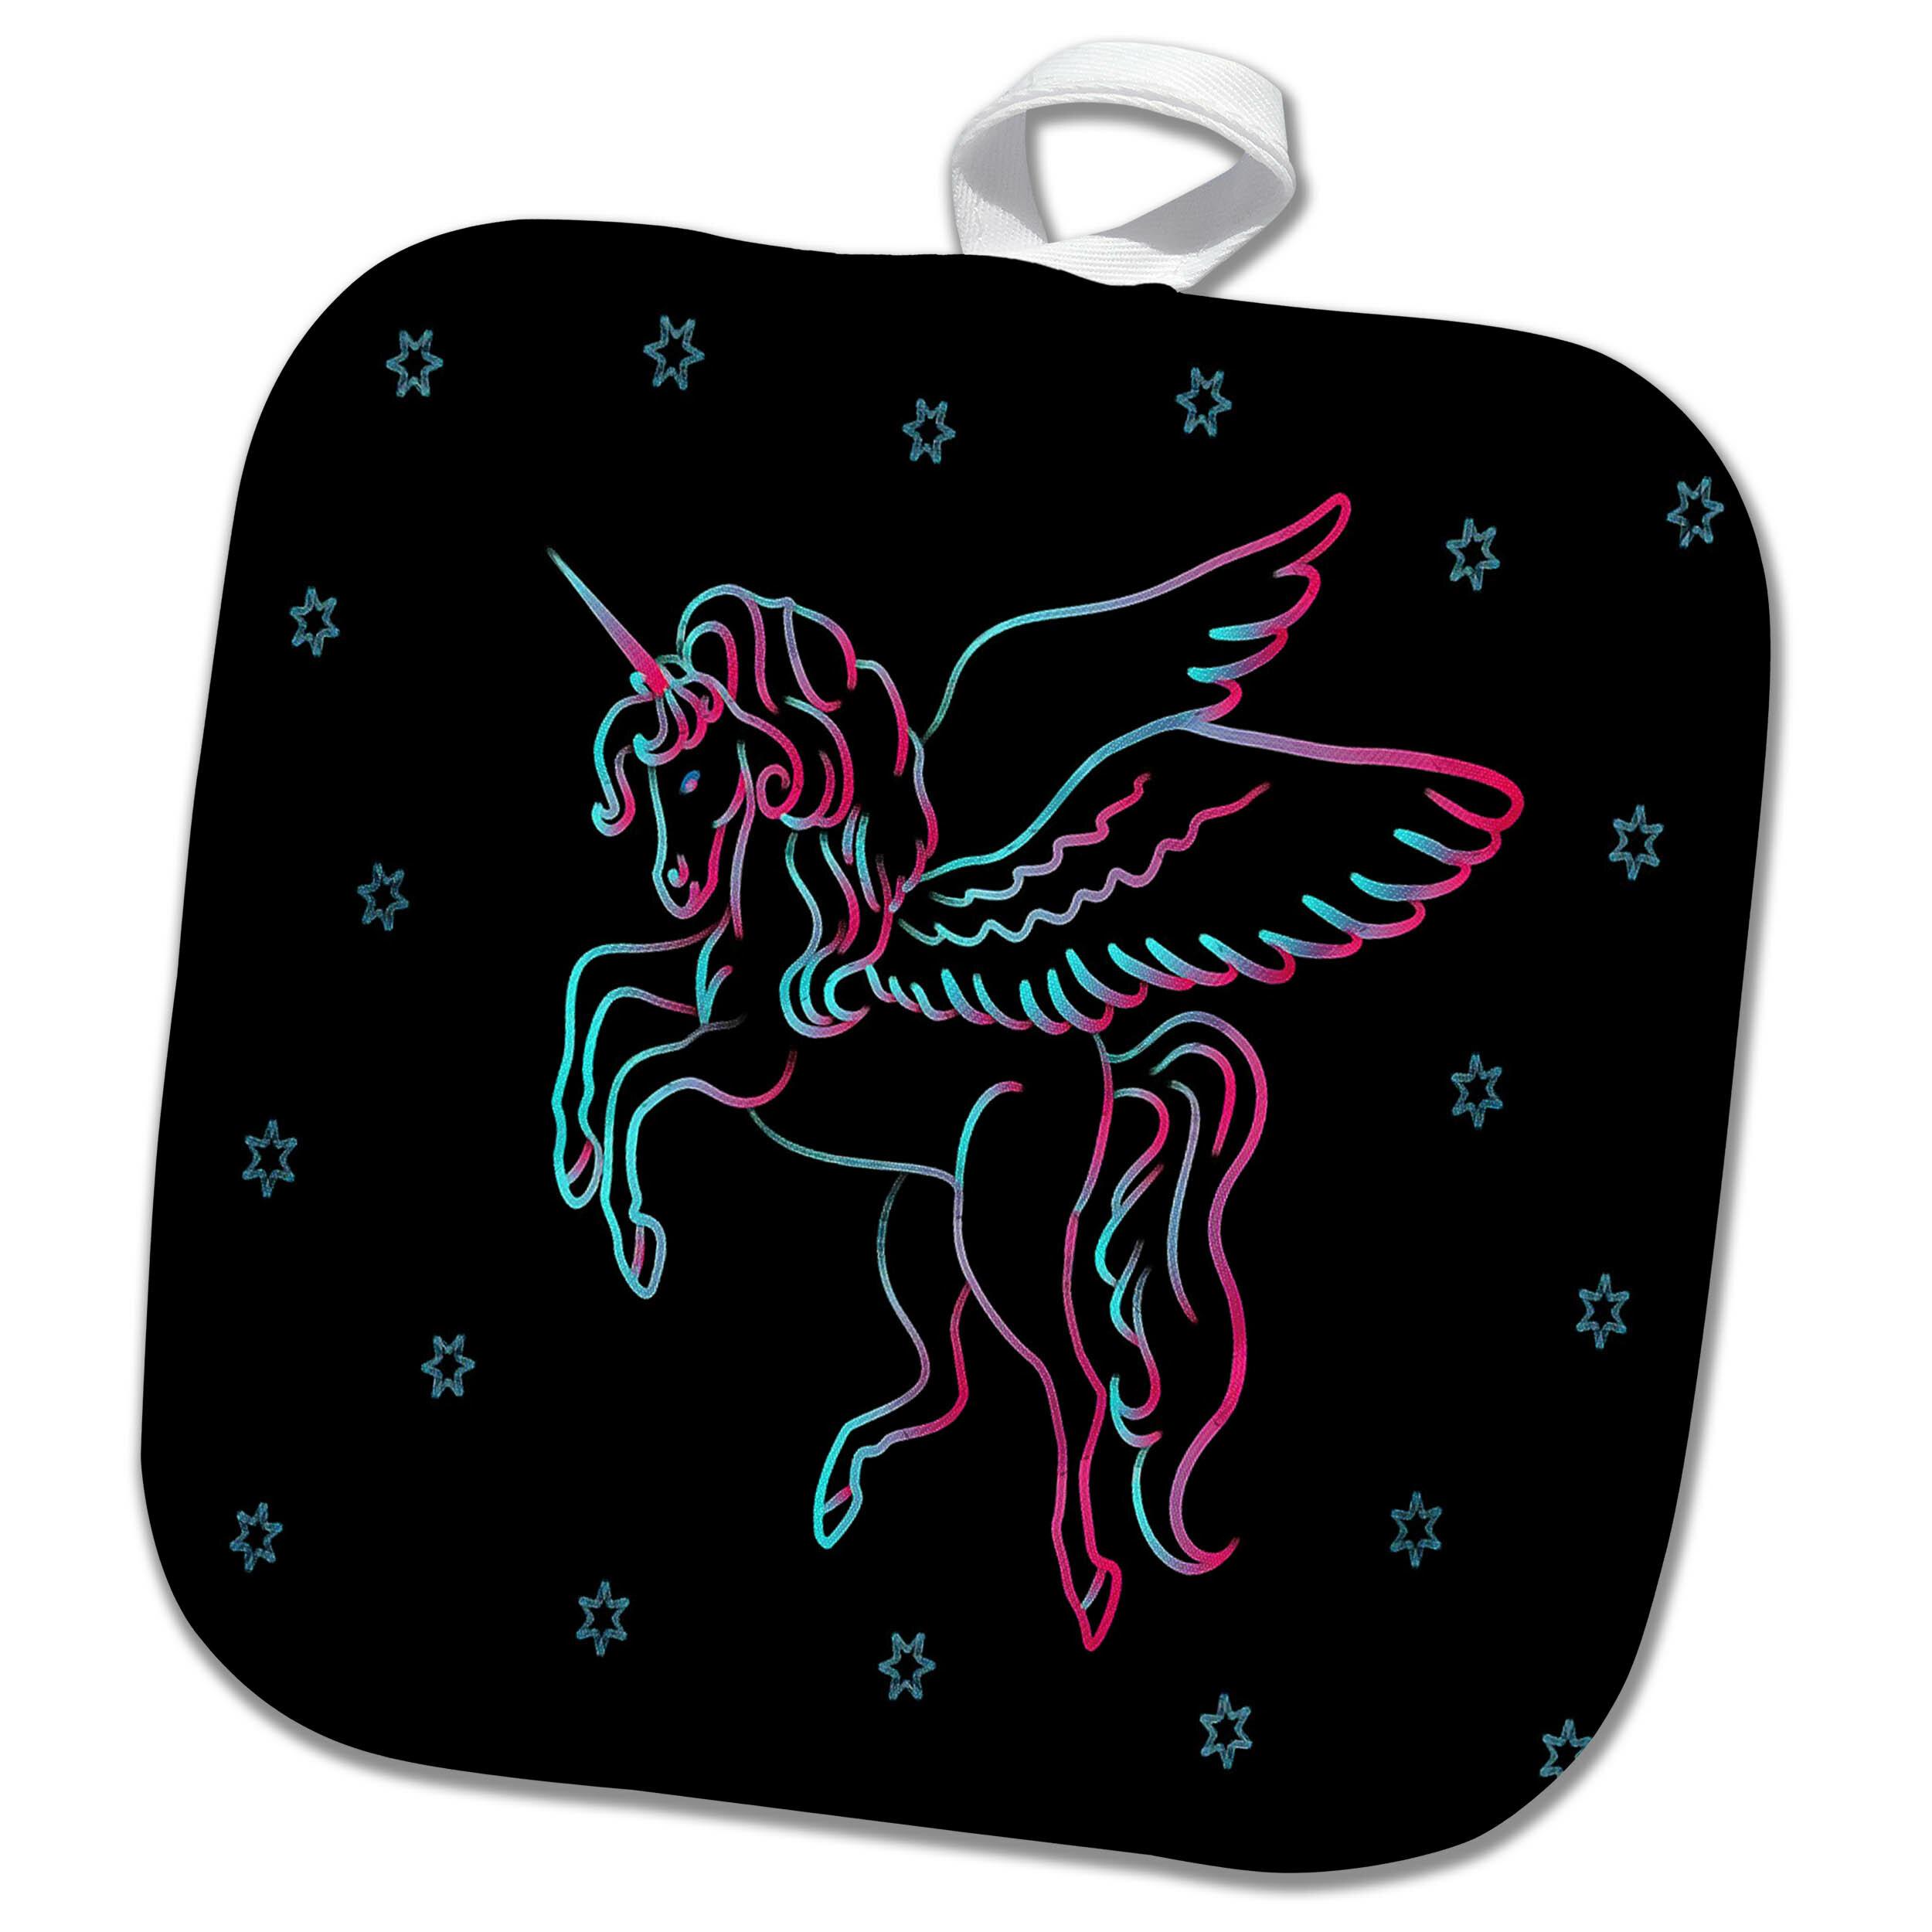 3drose Image Of Neon Water Aqua And Fuchsia Unicorn N Stars Potholder Wayfair